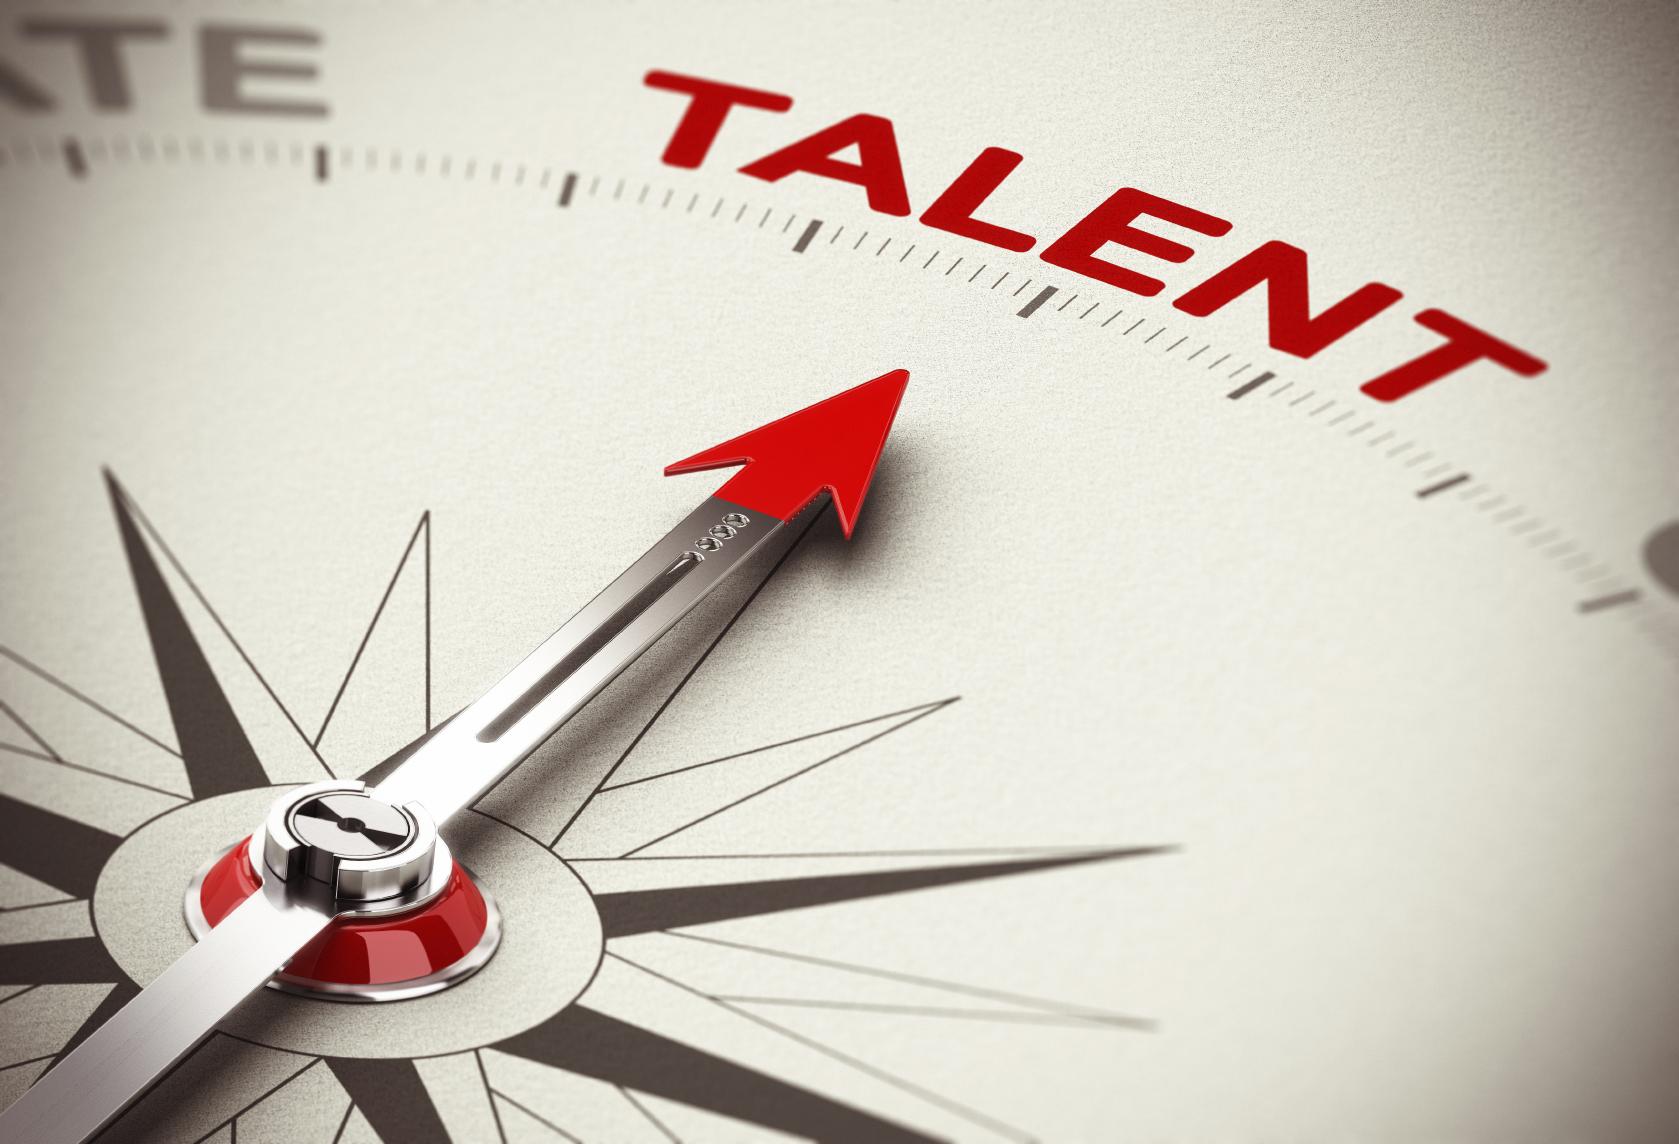 http://www.imoveilive.com/wp-content/uploads/2015/06/Talent.jpg